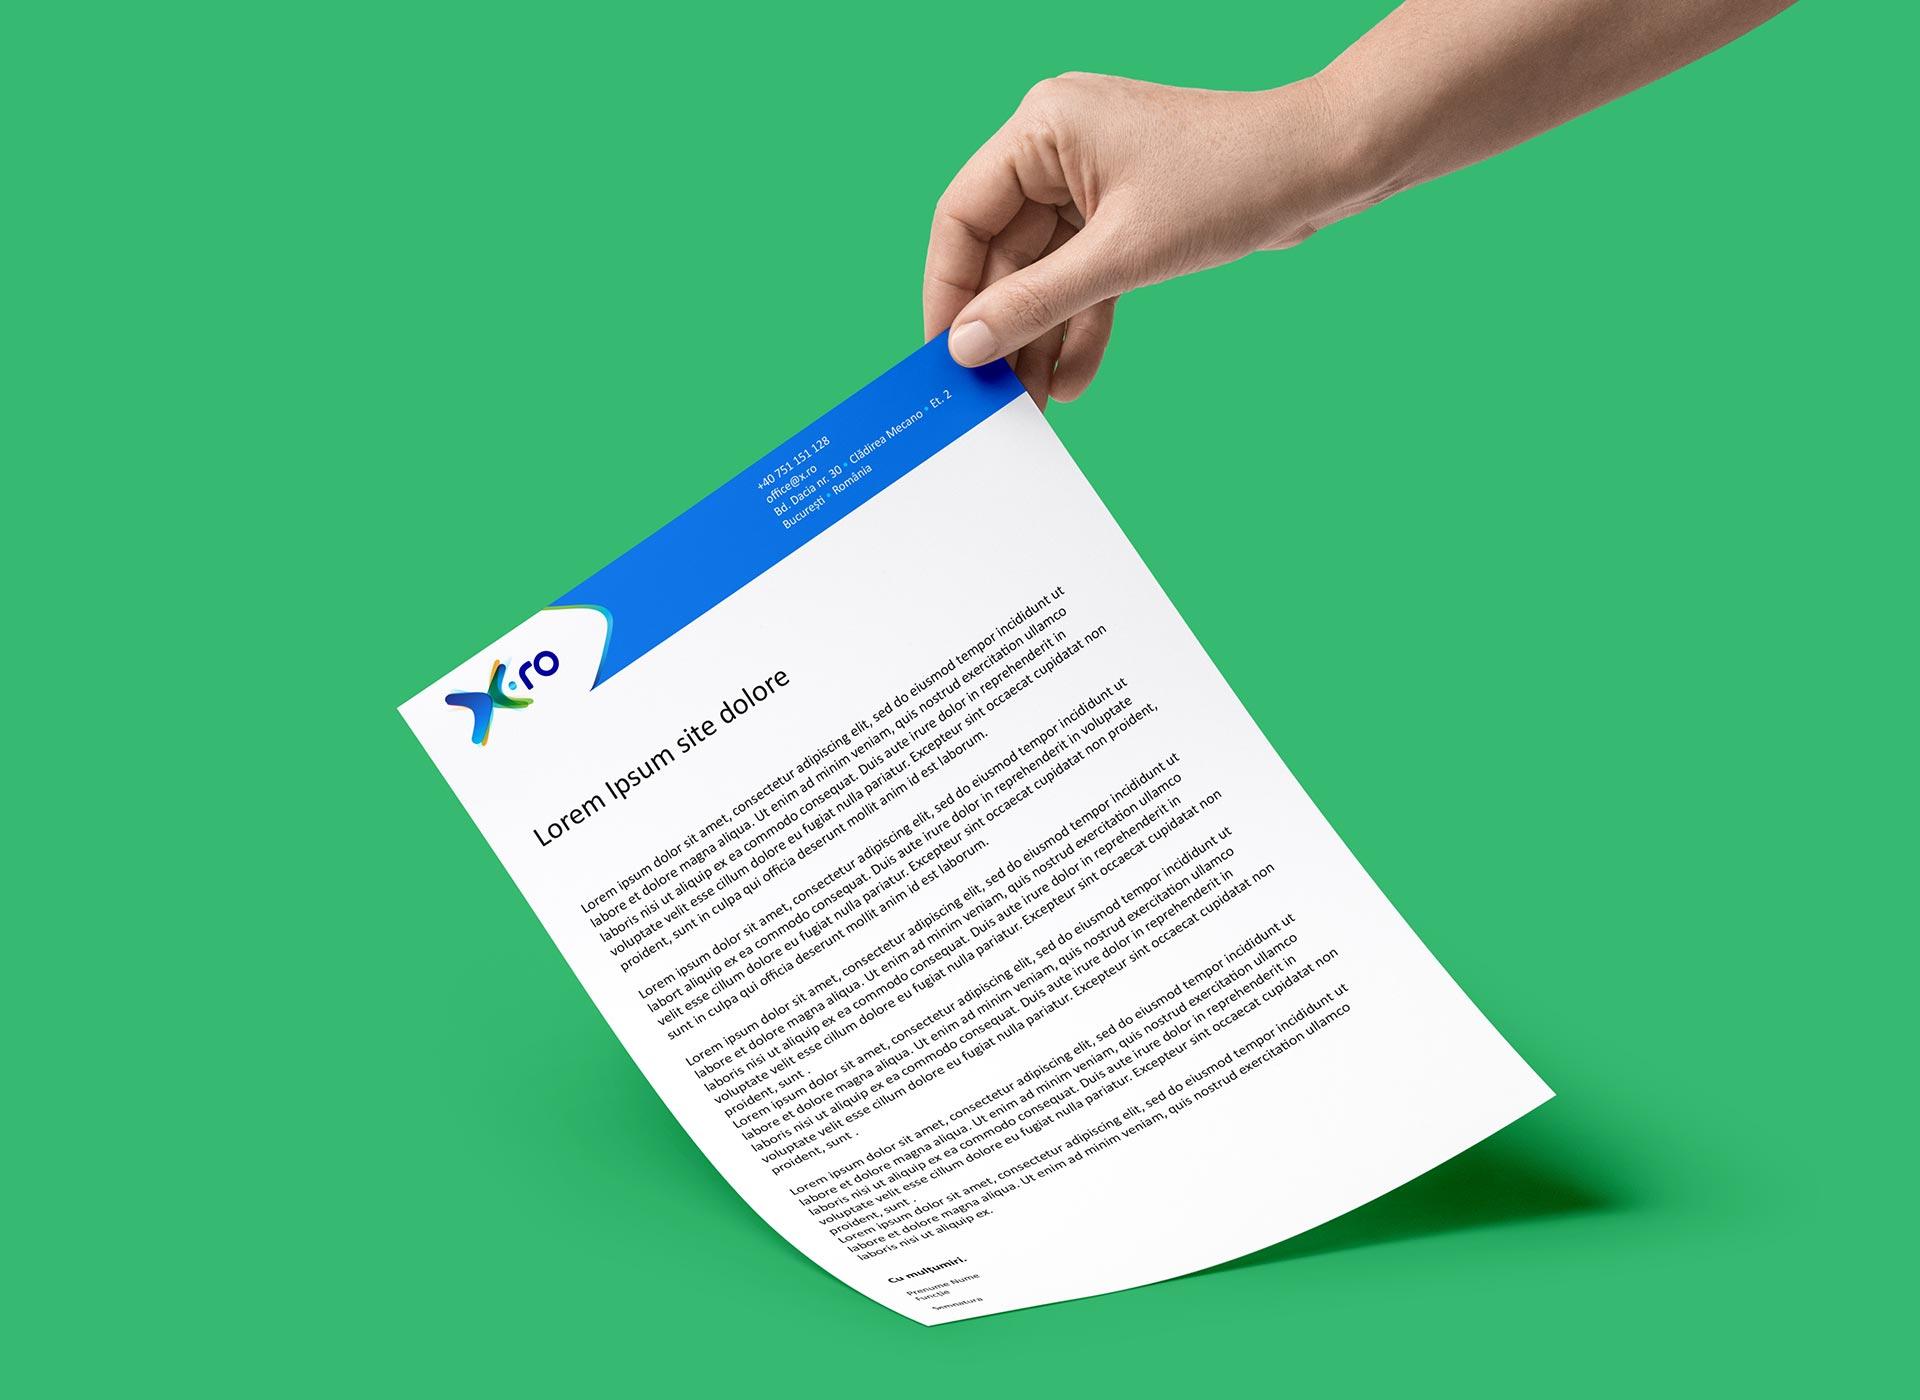 X.ro portfolio inoveo A4 letter